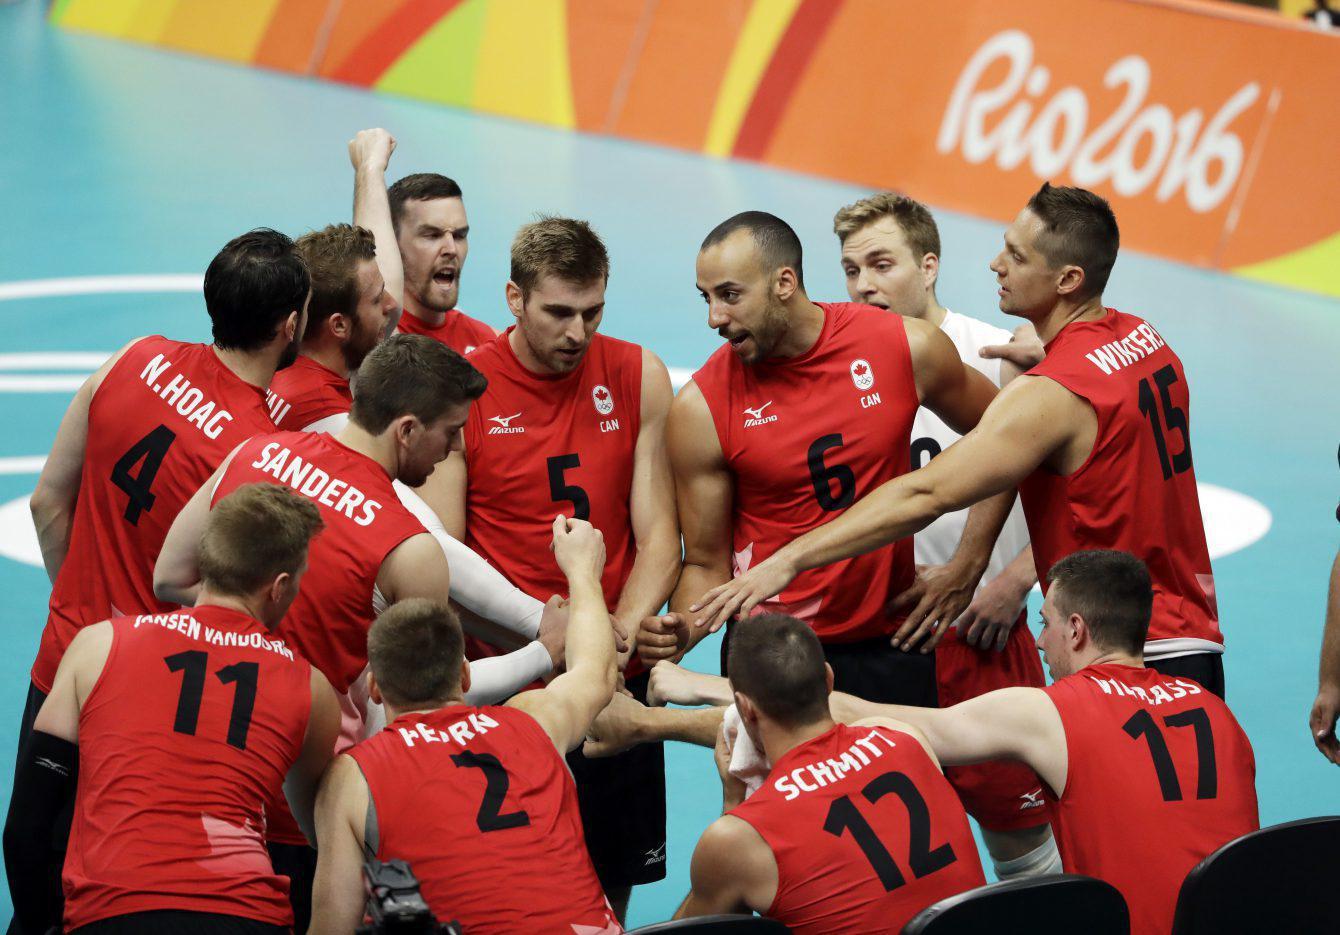 Canada's volleyball team celebrates round robin win against Mexico at Rio 2016 on Saturday, August 13, 2016. (AP Photo/Matt Rourke)